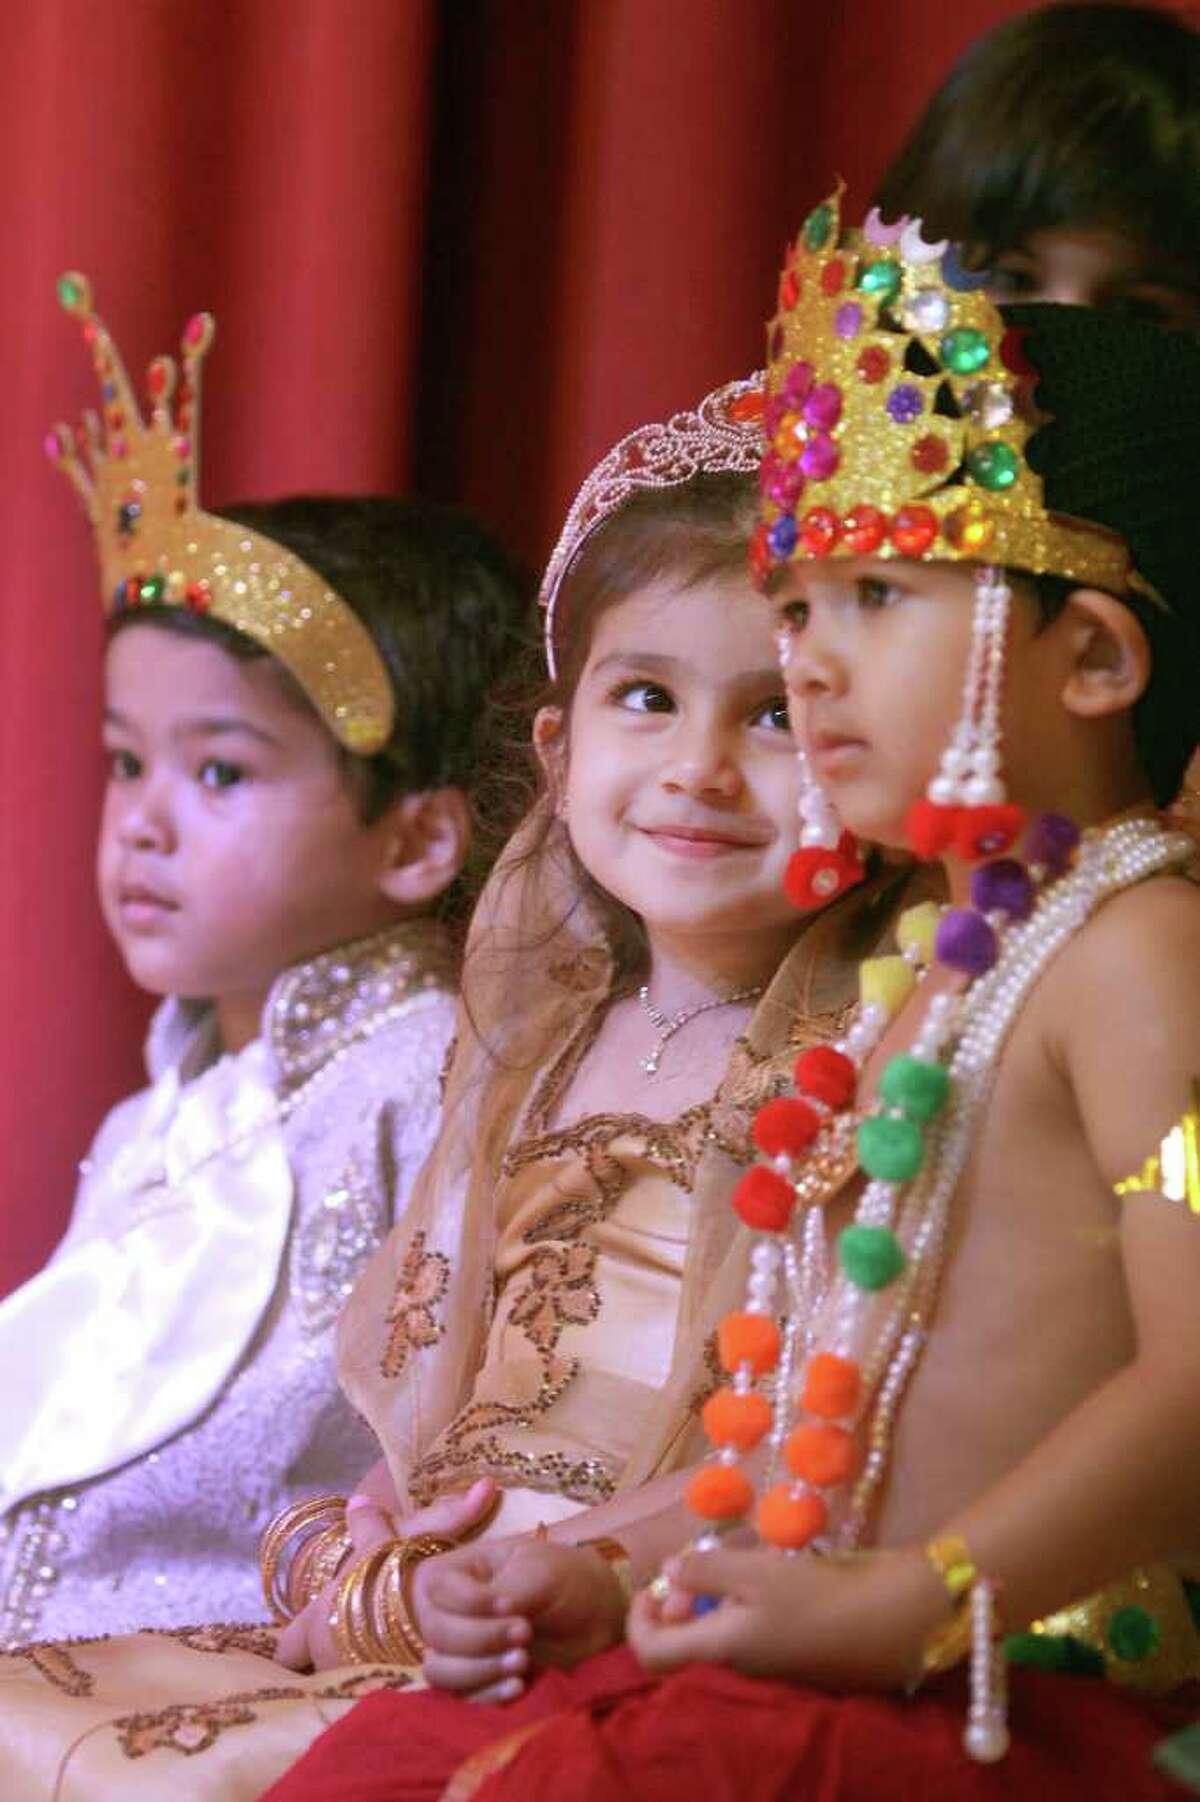 Aanya Malik 3, (center) looks up at Kuber Nilgiri 3 (right) during a children's program at the celebration of Diwali, The Festival of Lights at the Arya Samaj Greater Houston Culture Center on Saturday, October 22, 2011. On left is Neel Chhetri 3. (Alan Warren, For the Chronicle)